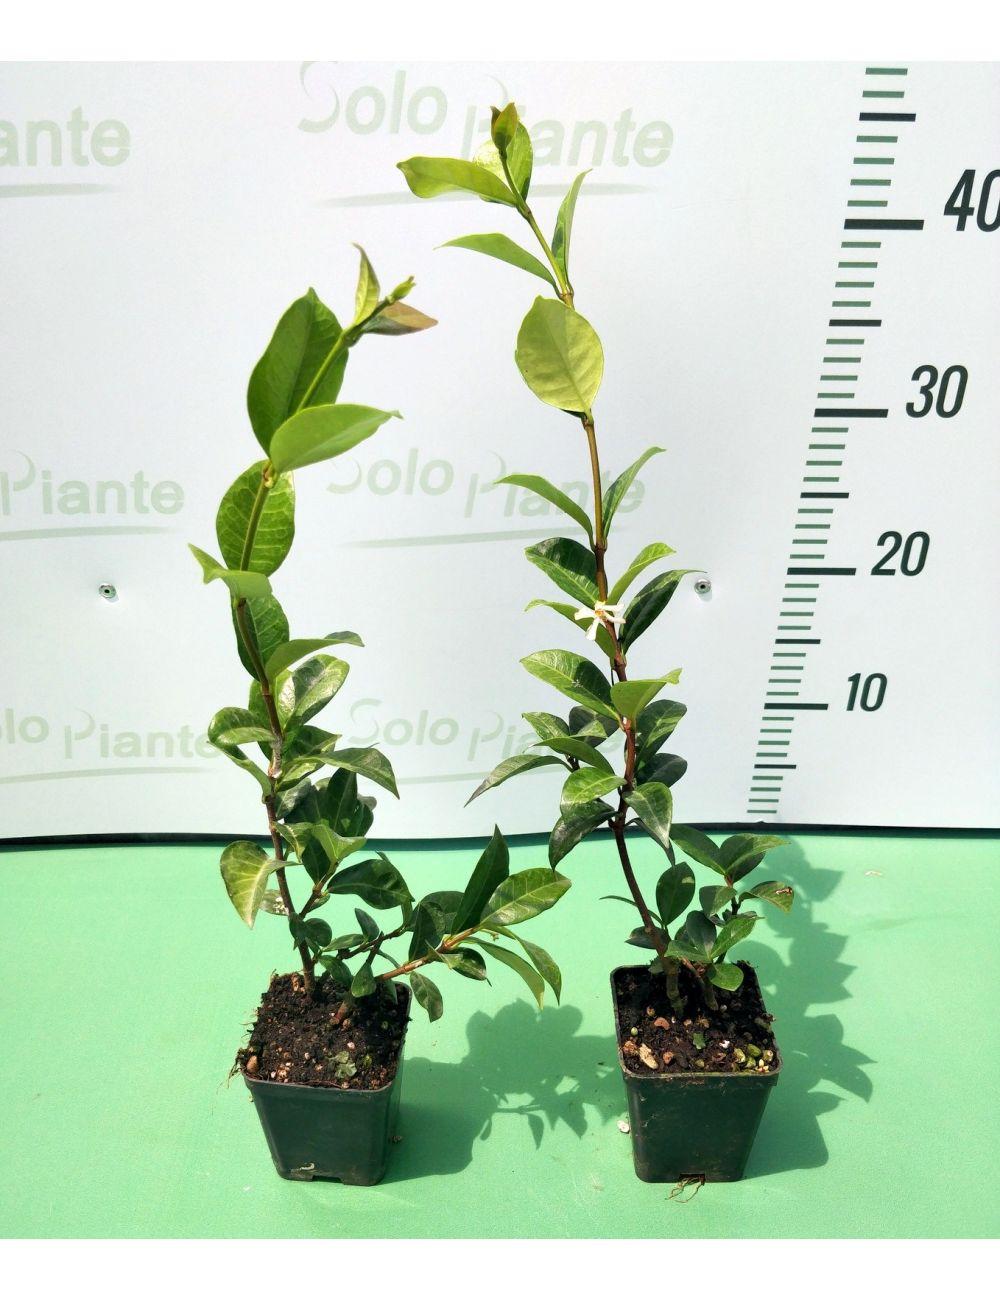 25 x Gelsomino (Trachelospermum Jasminoides) - pack